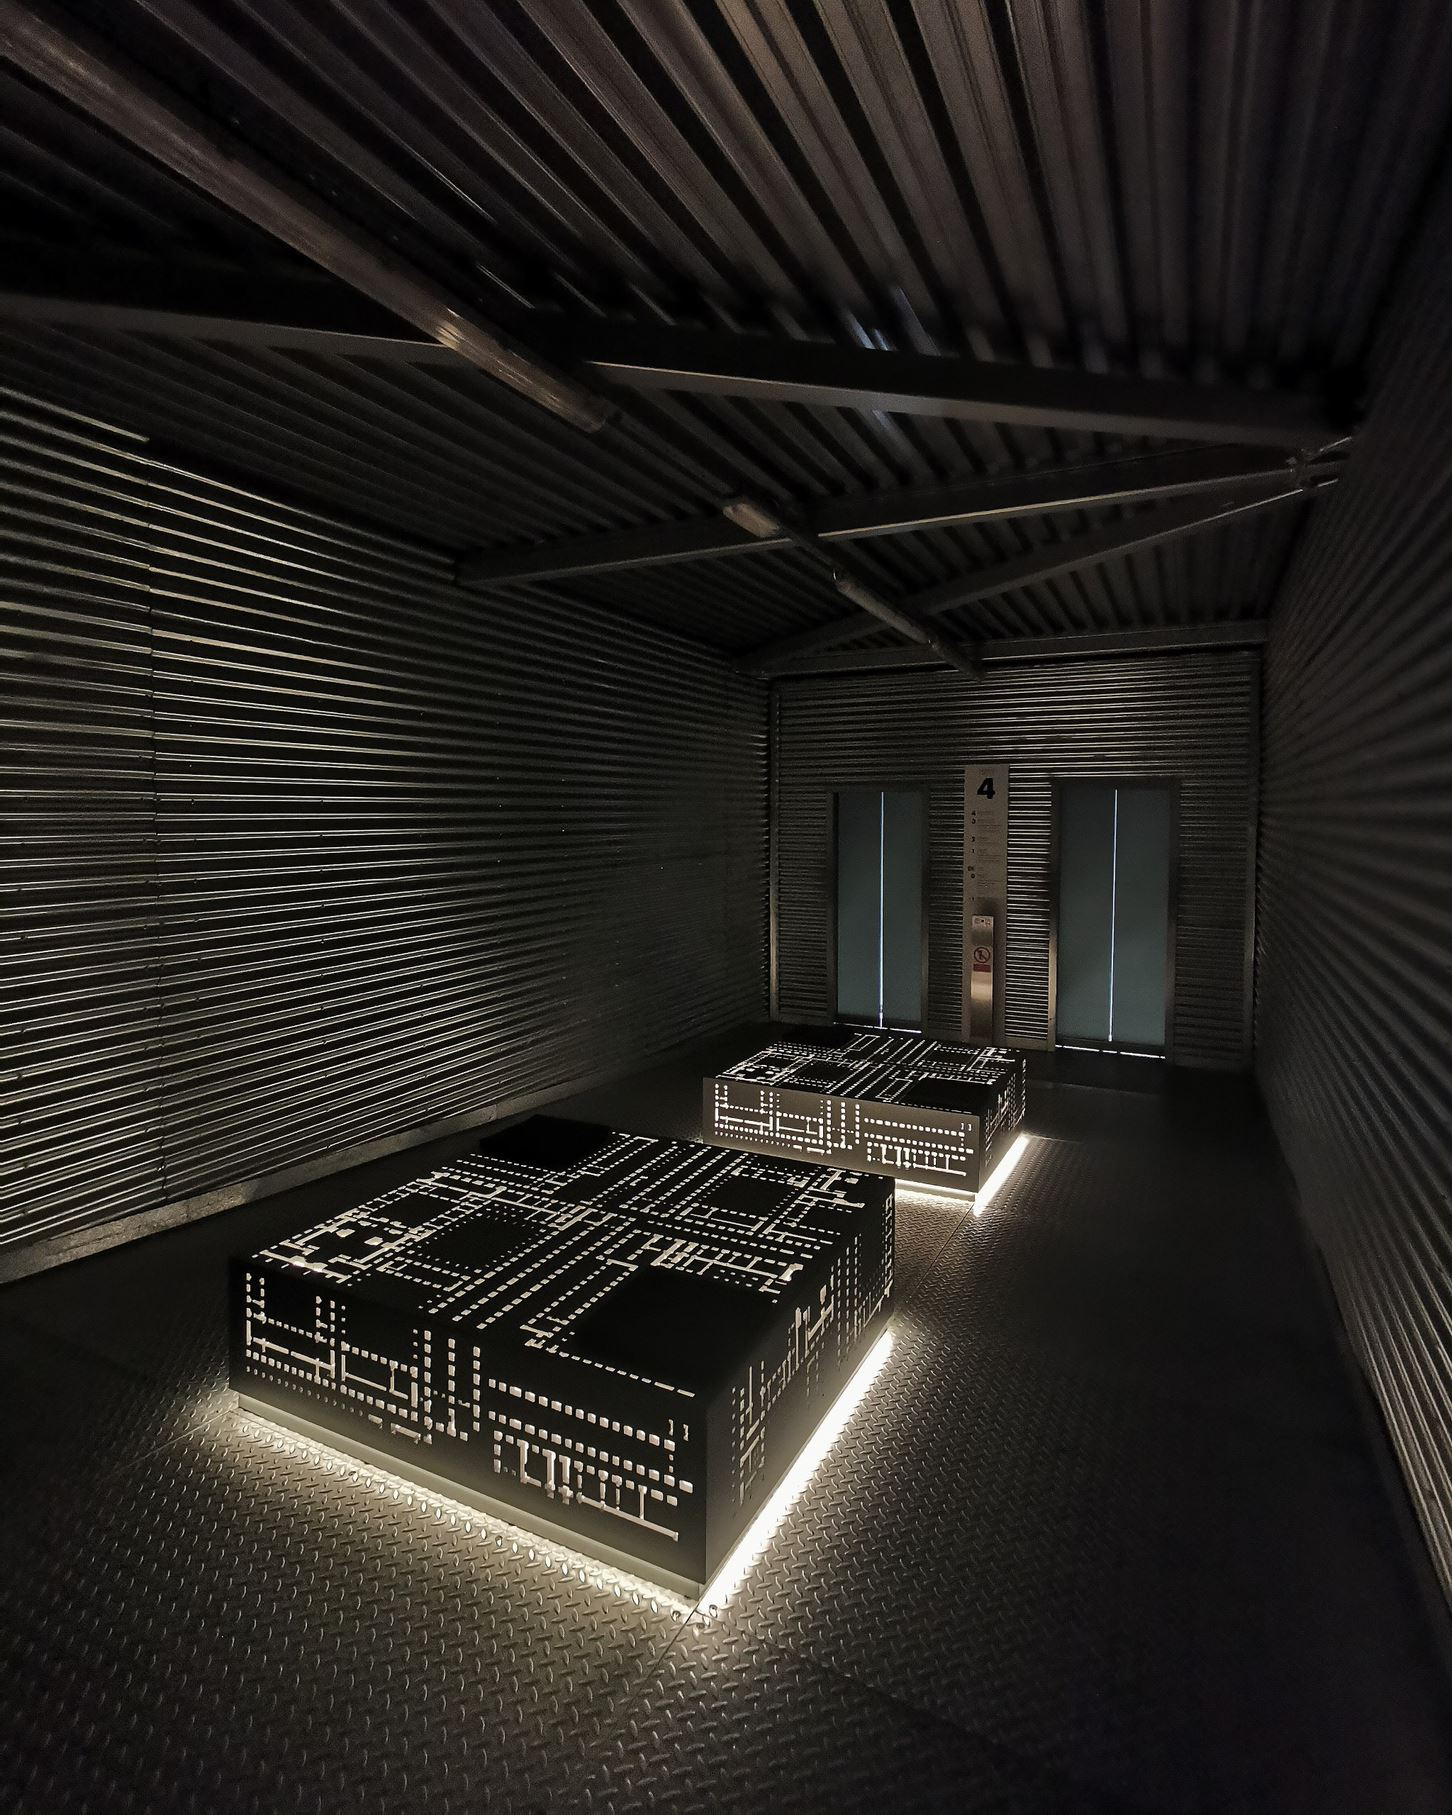 Arkitektonisk utstilling / Foto: Museo Reina Sofía